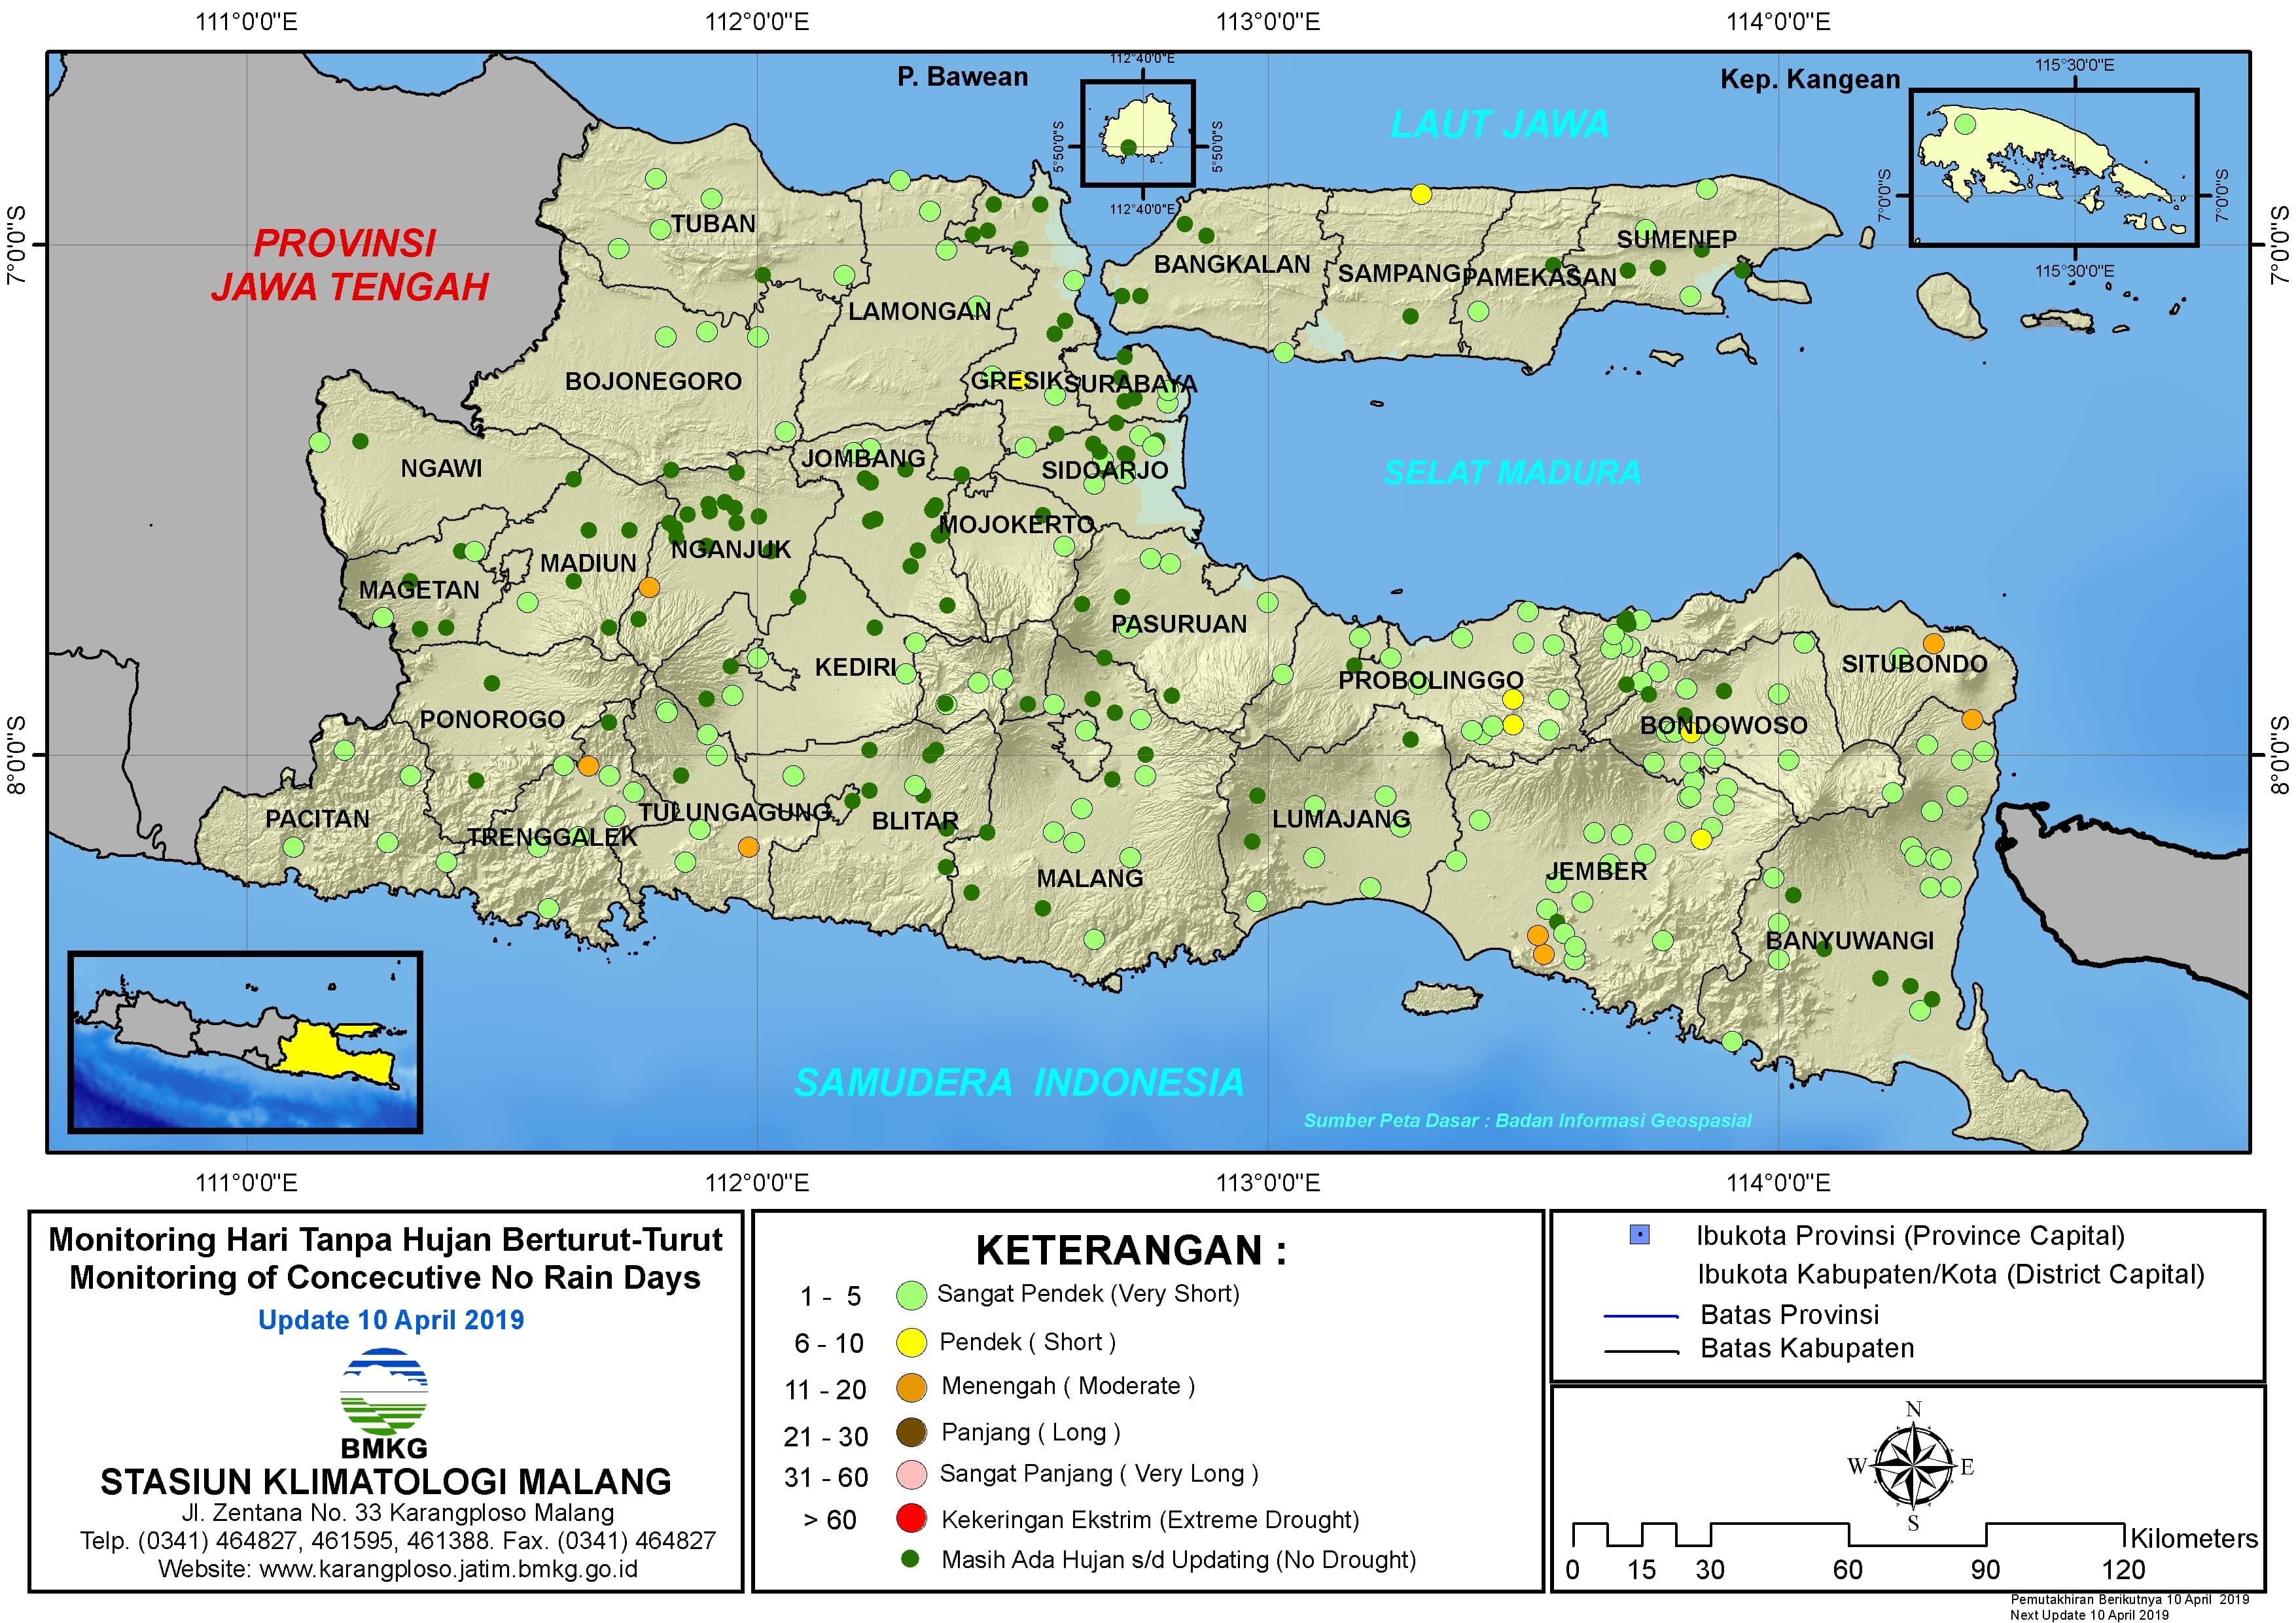 Peta Monitoring Hari Tanpa Hujan Berturut Turut Update 10 April 2019 di Provinsi Jawa Timur